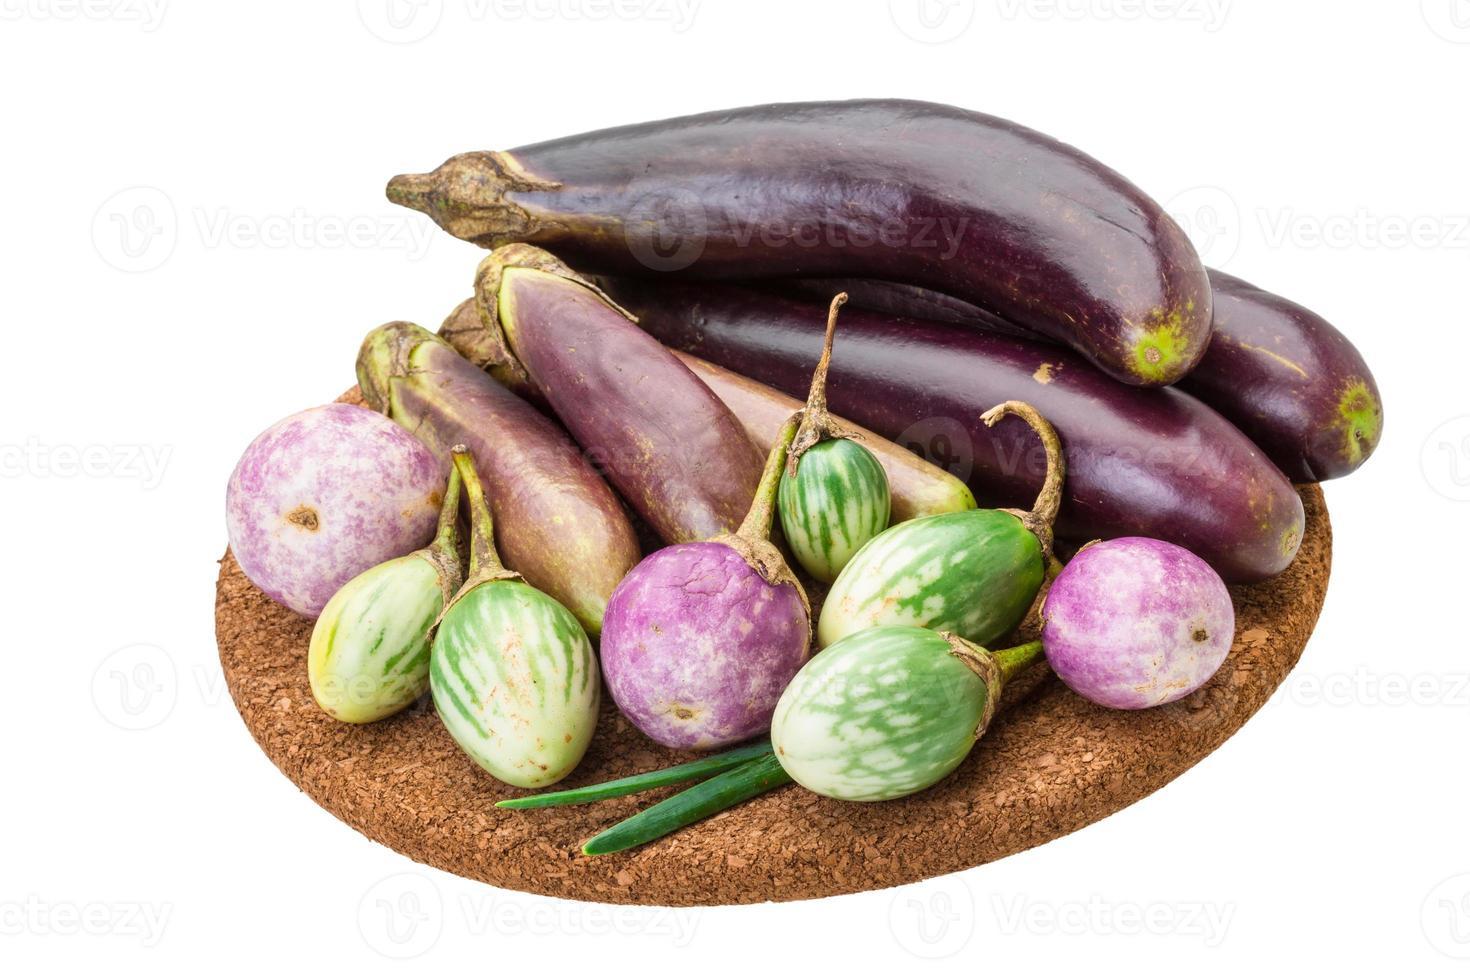 Aziatische aubergine assortie foto